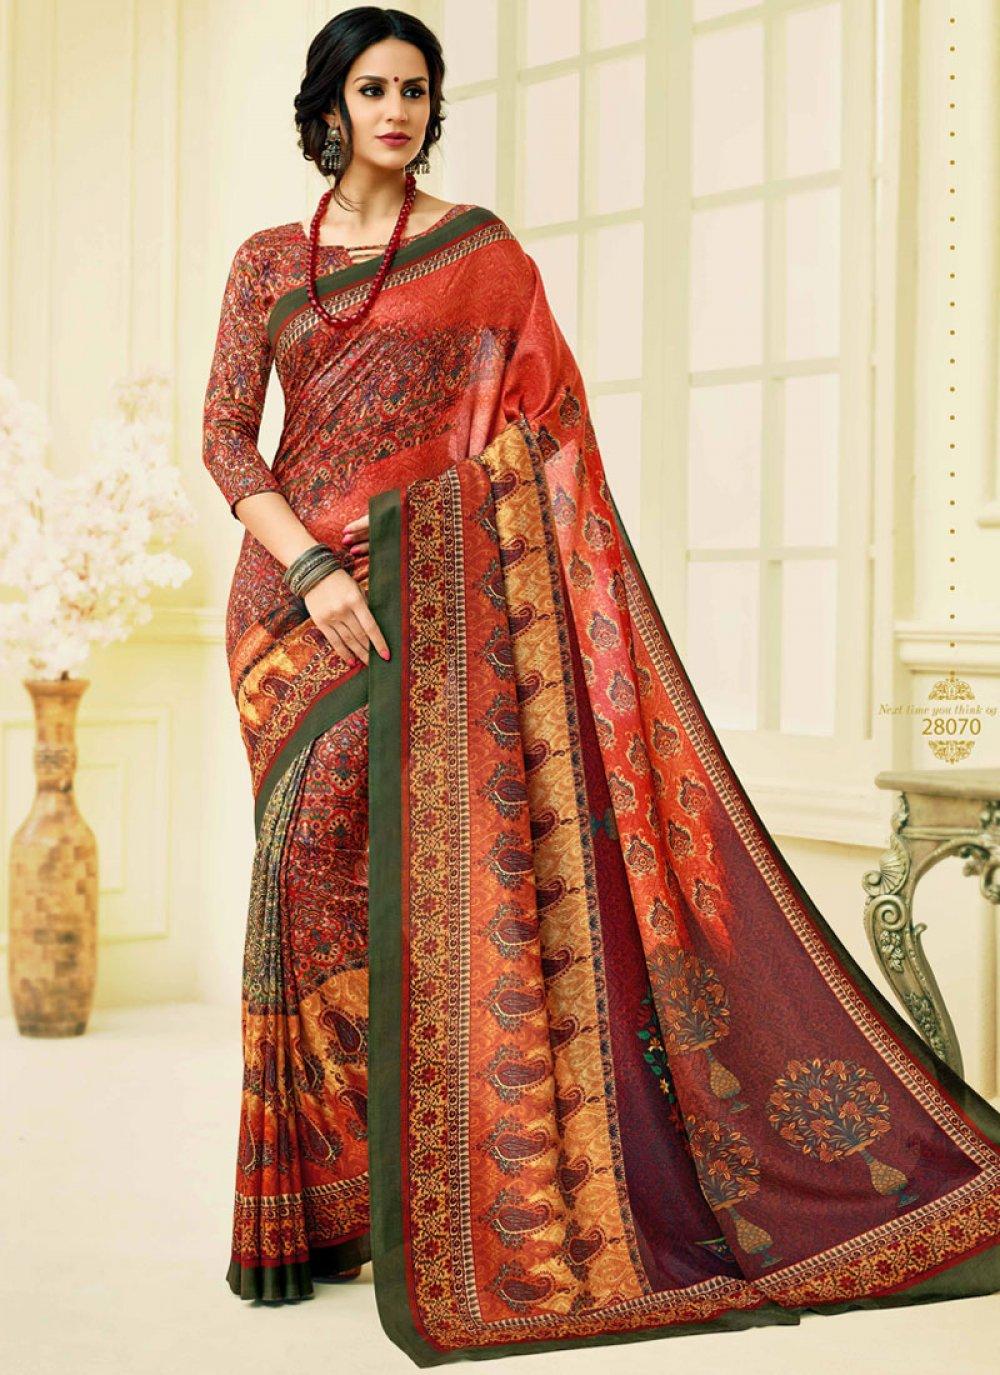 Print Tussar Silk Printed Saree in Multi Colour